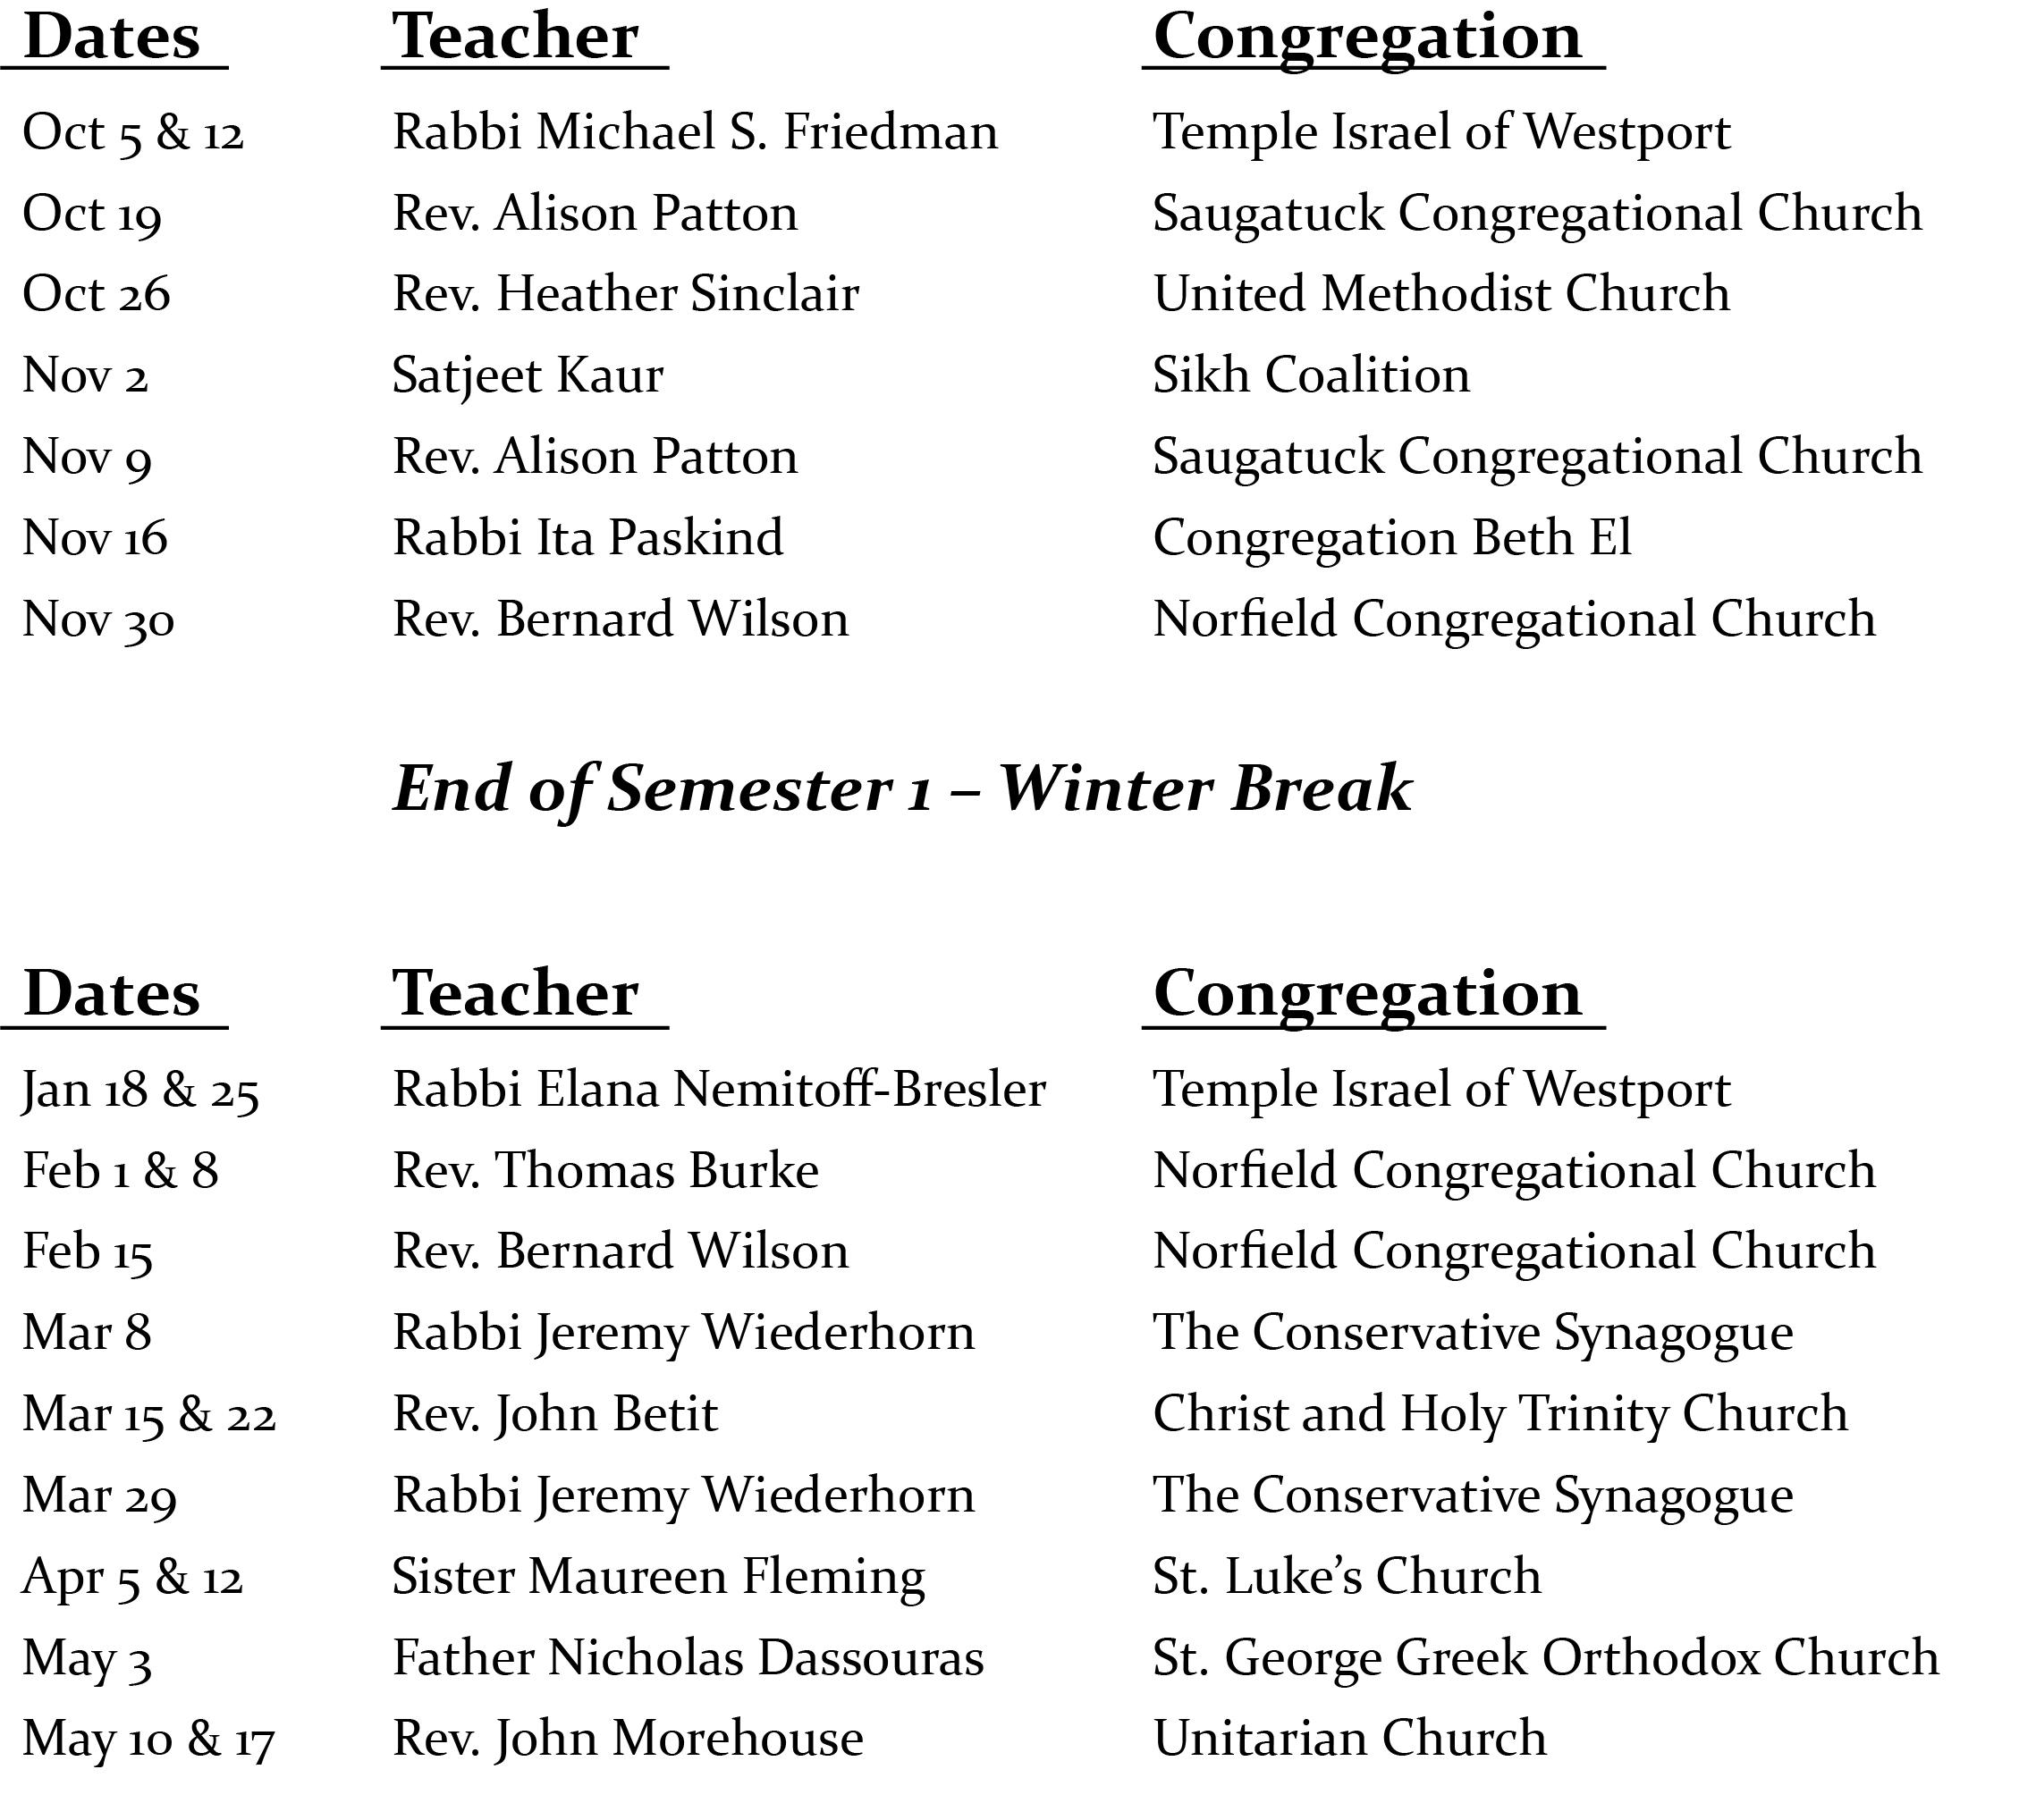 interfaith theology schedule 2021